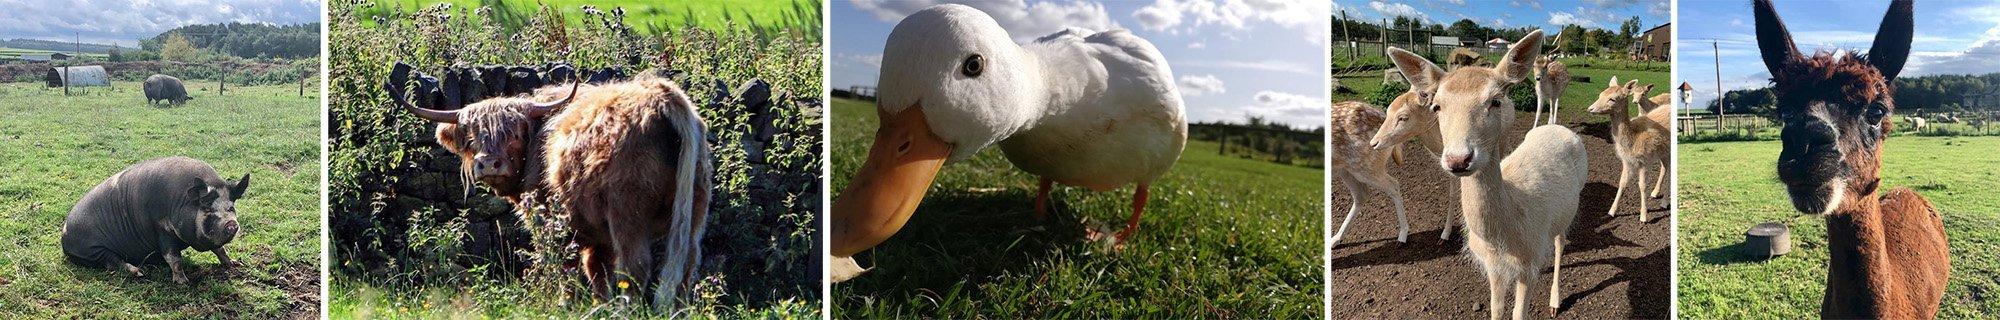 Matlock Farm Park  -  Derbyshire  -  Pigs Ducks Alpacas And More